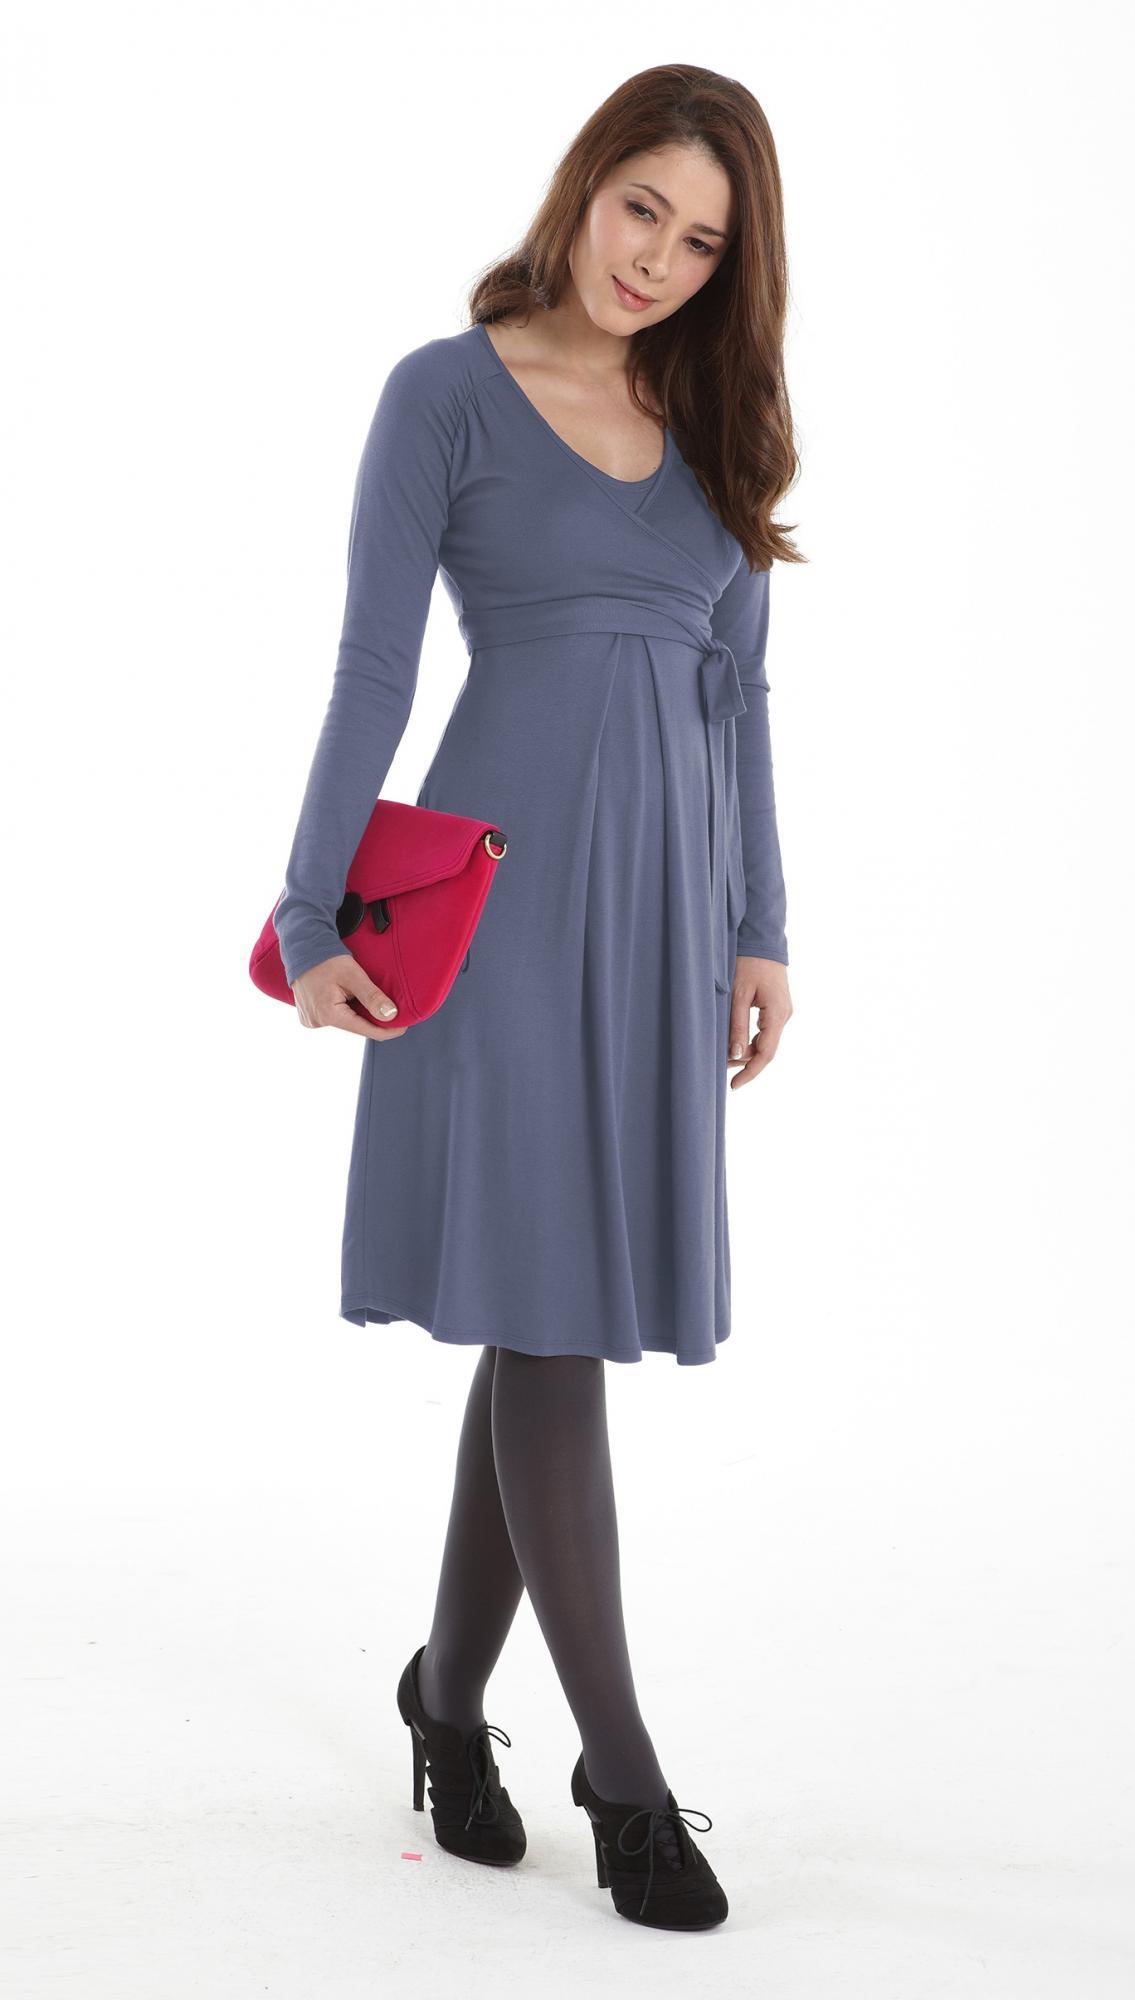 mothers-en-vogue-faux-wrap-nurwsing-dress-velvet-morning-3.jpg